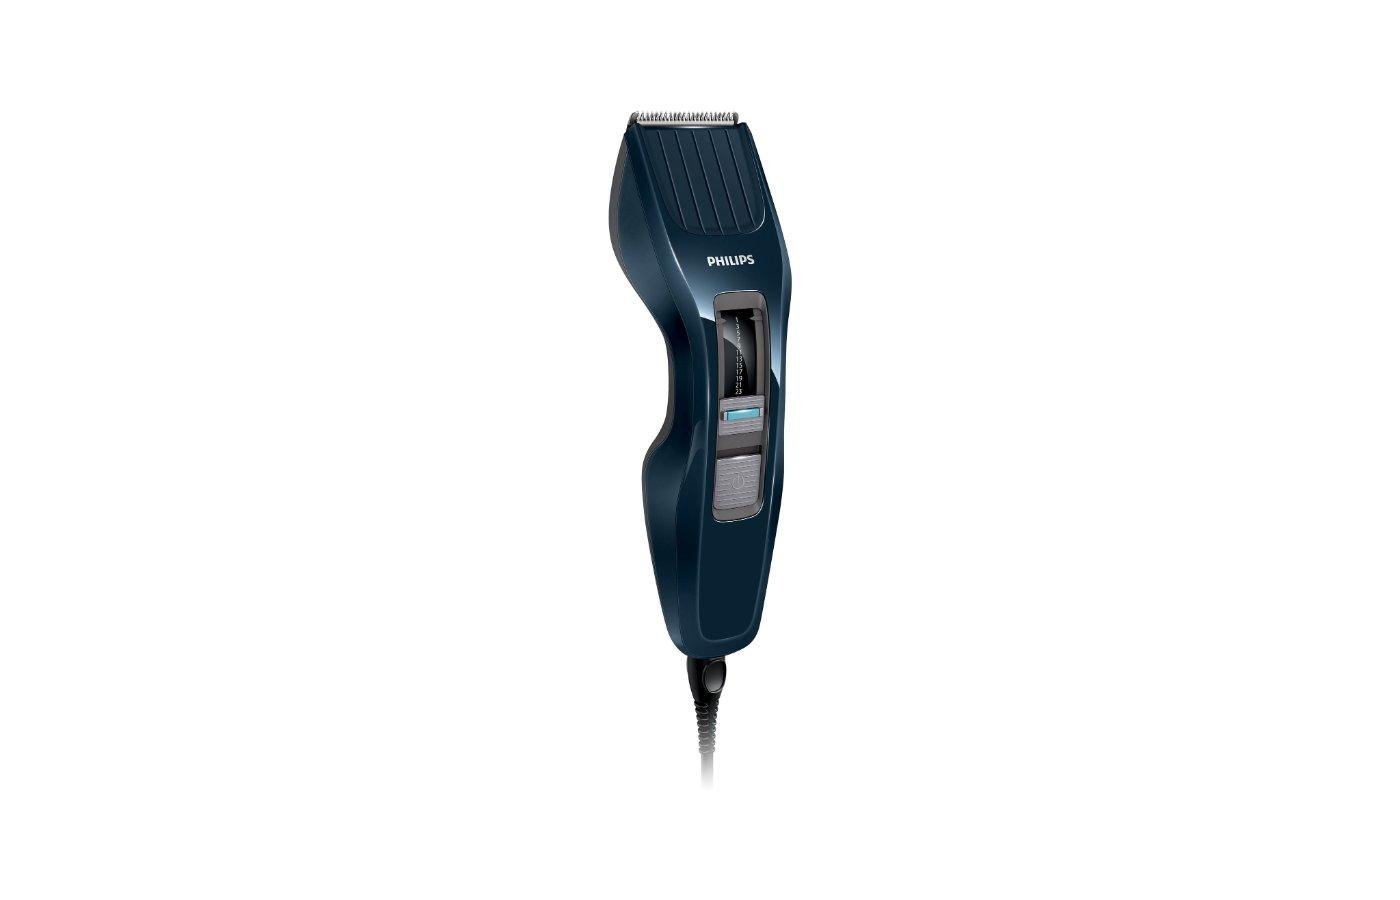 Машинка для стрижки волос PHILIPS HC 3400/15